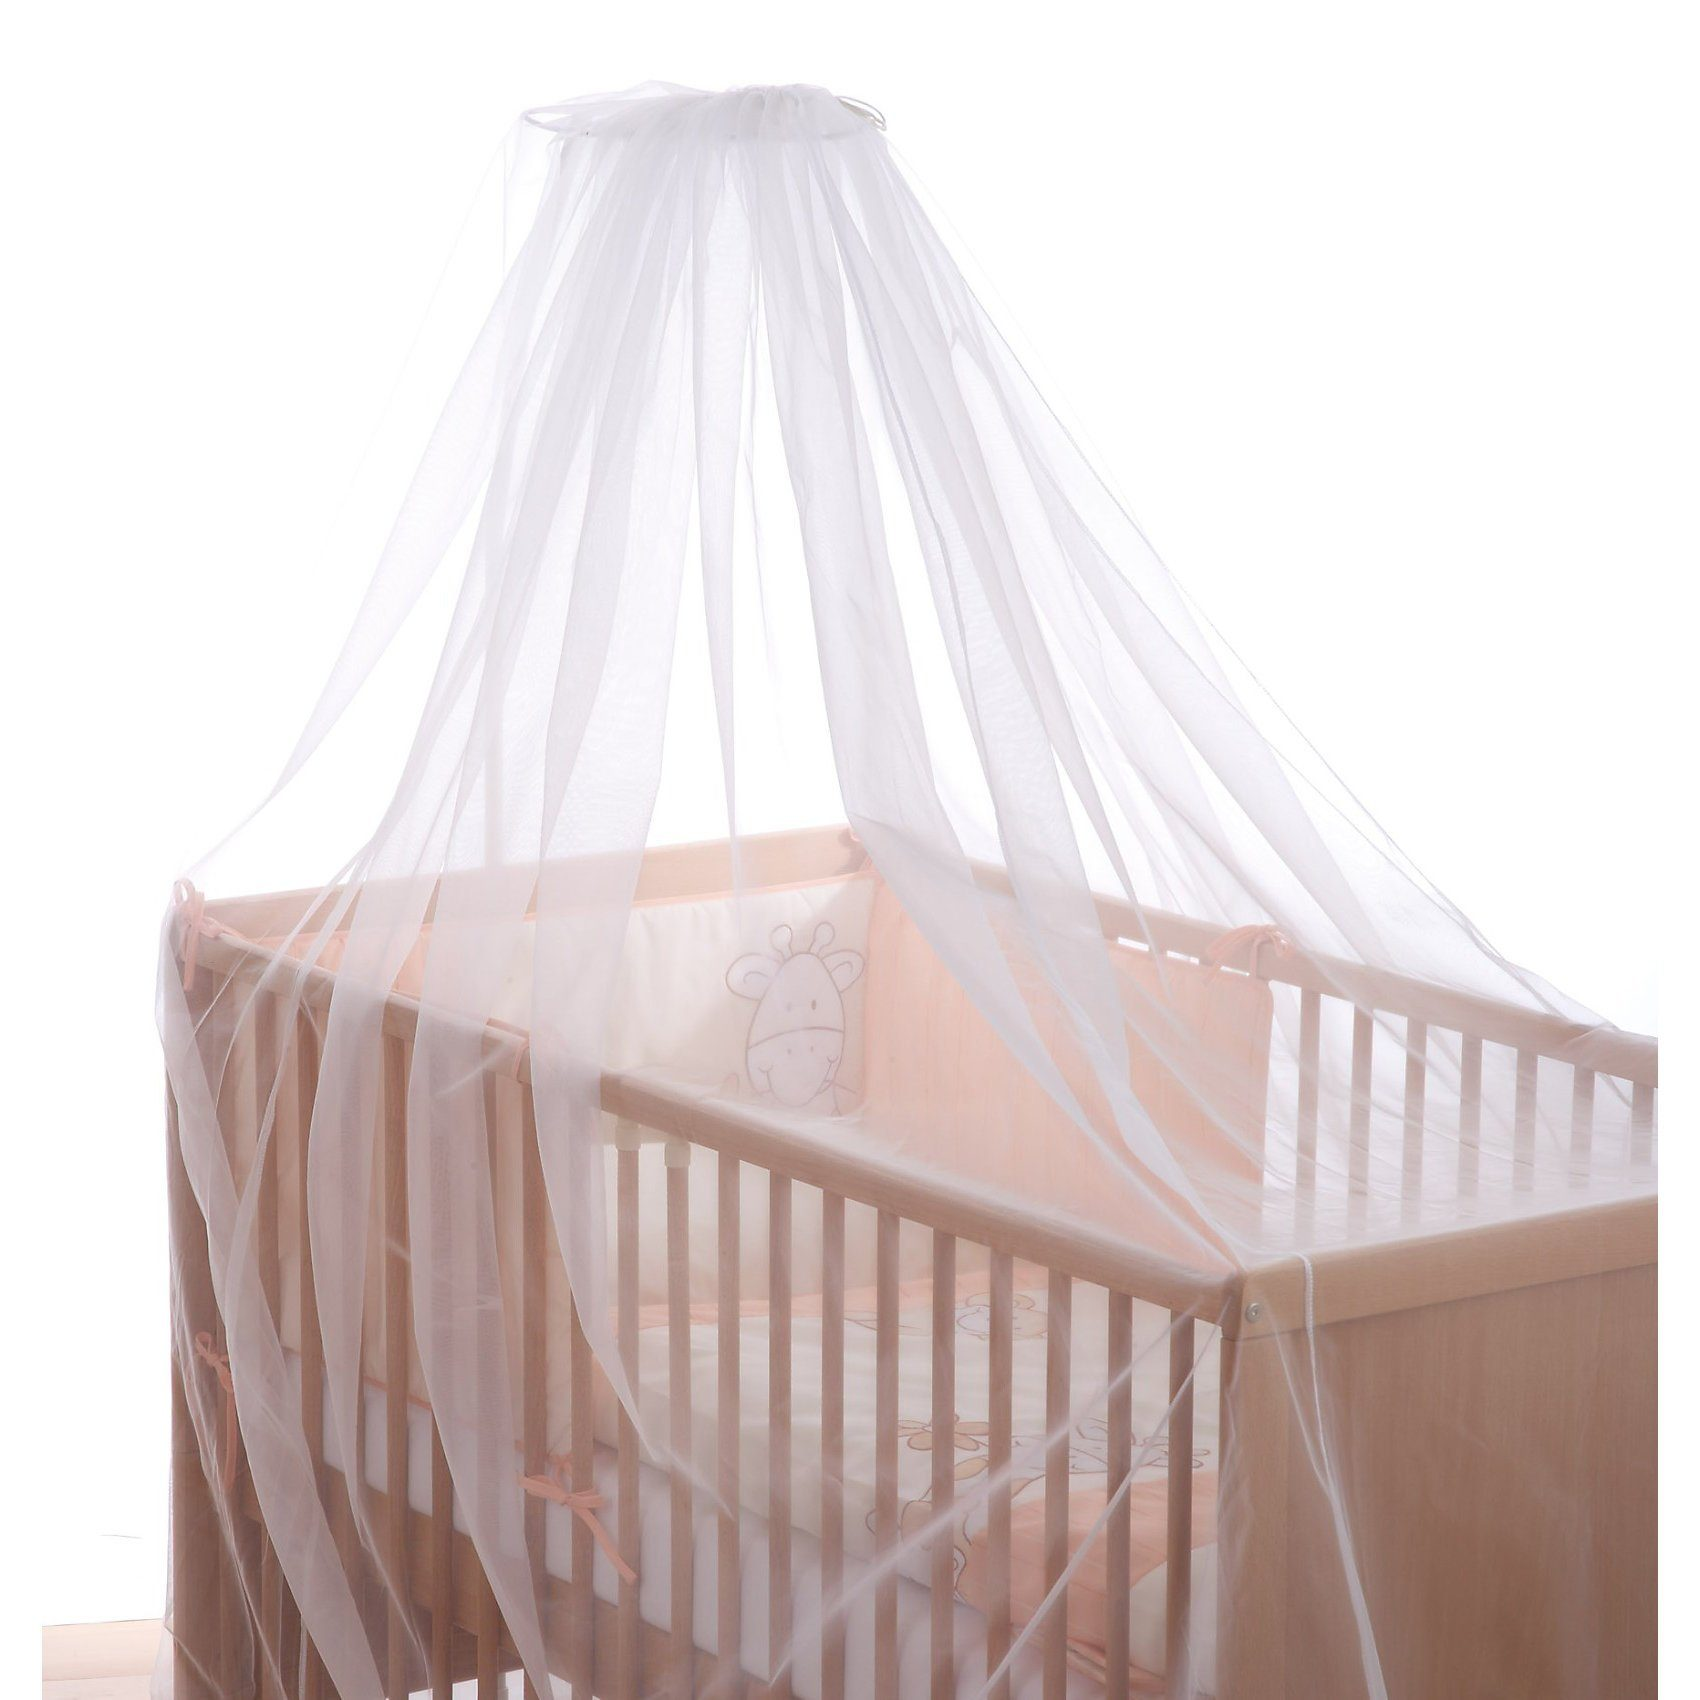 Alvi Insektennetz für Kinderbett